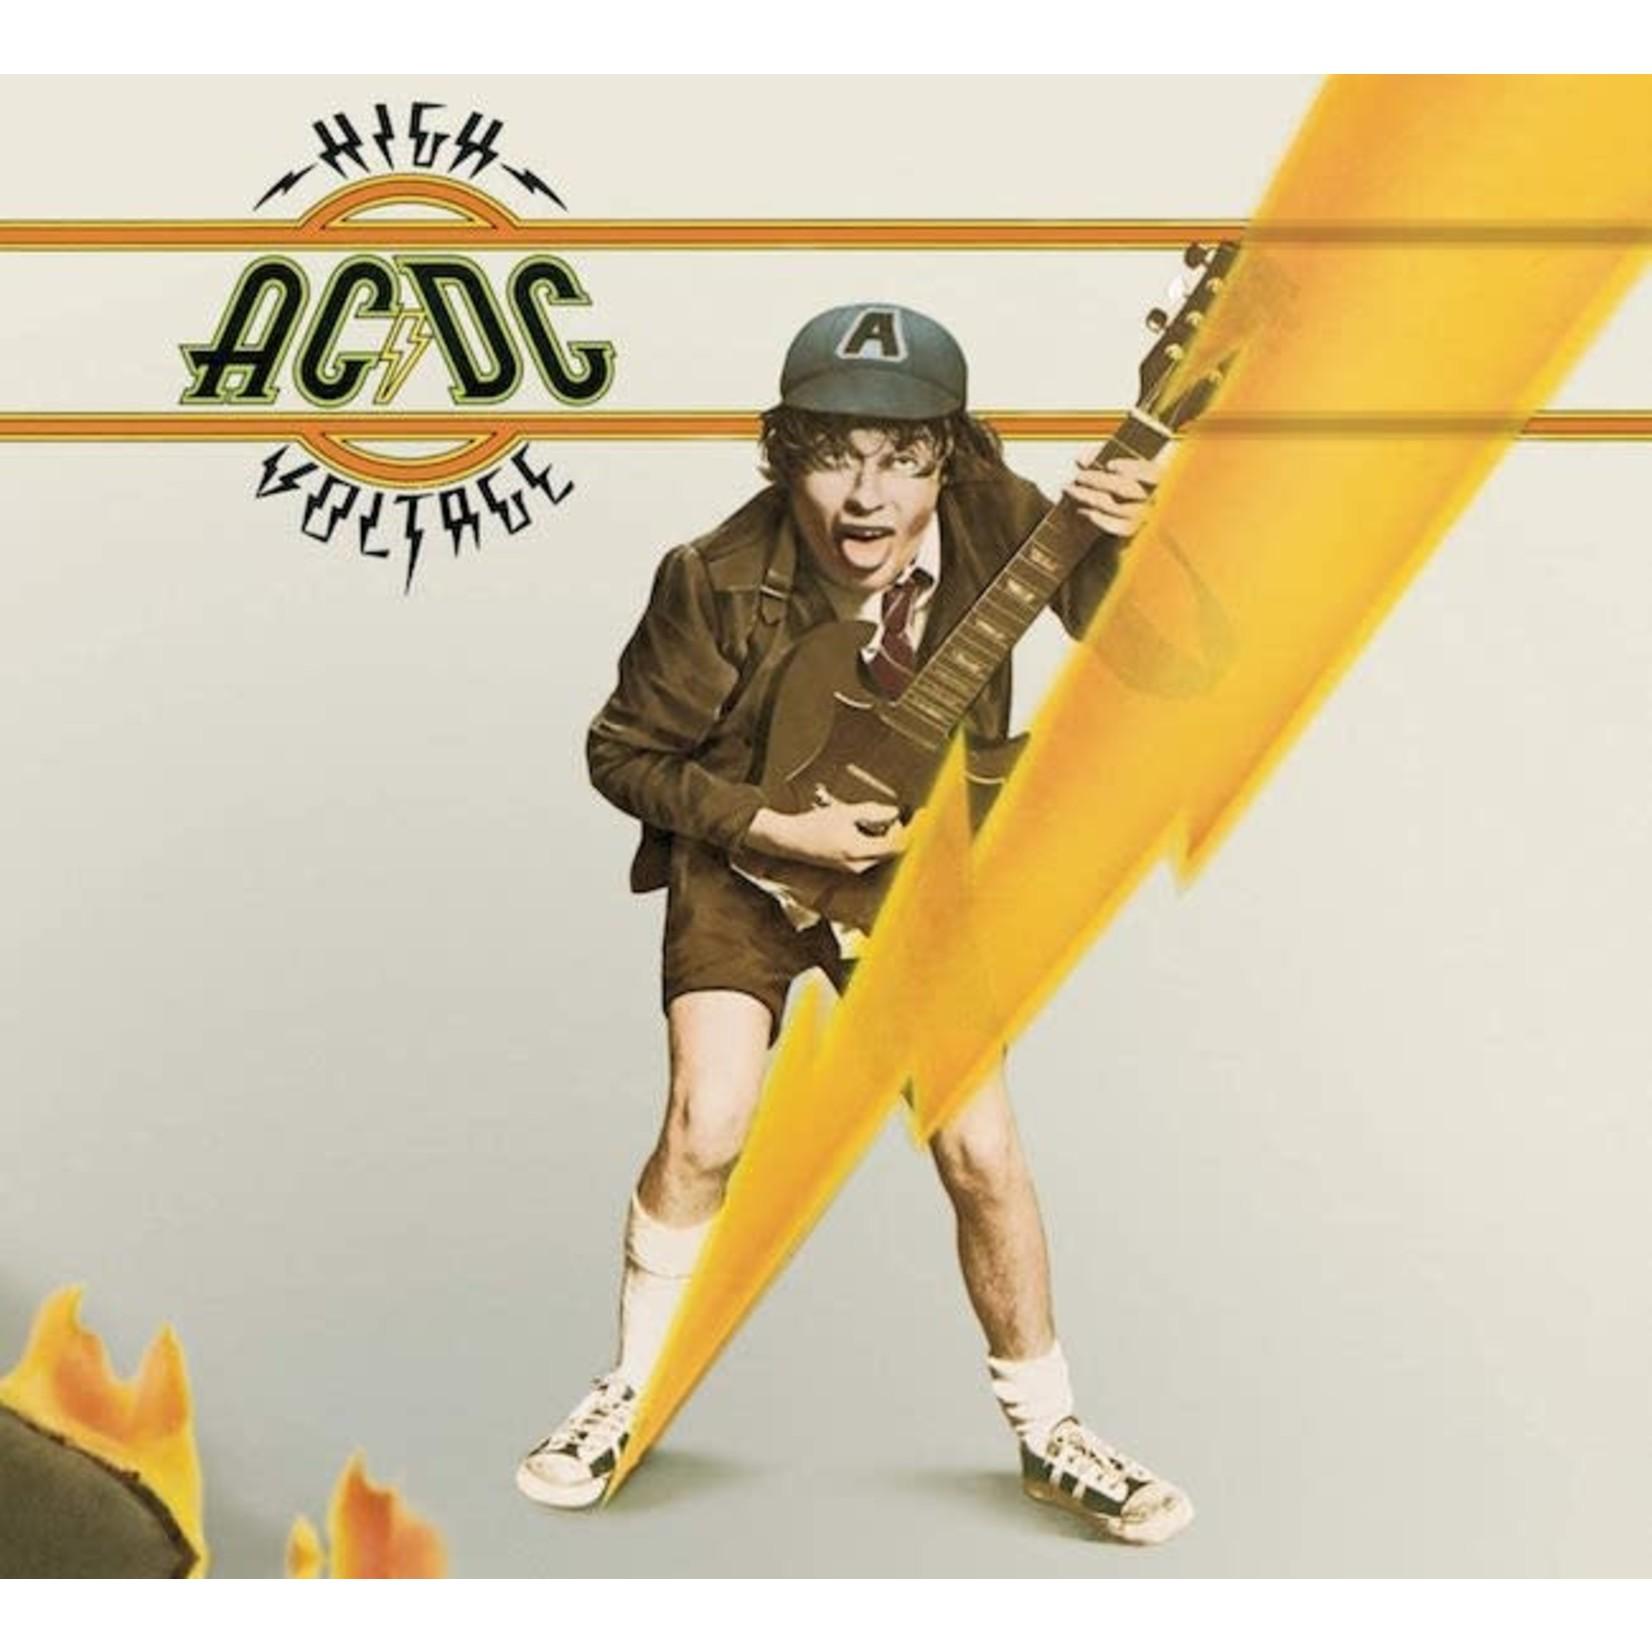 [Vintage] AC/DC: High Voltage